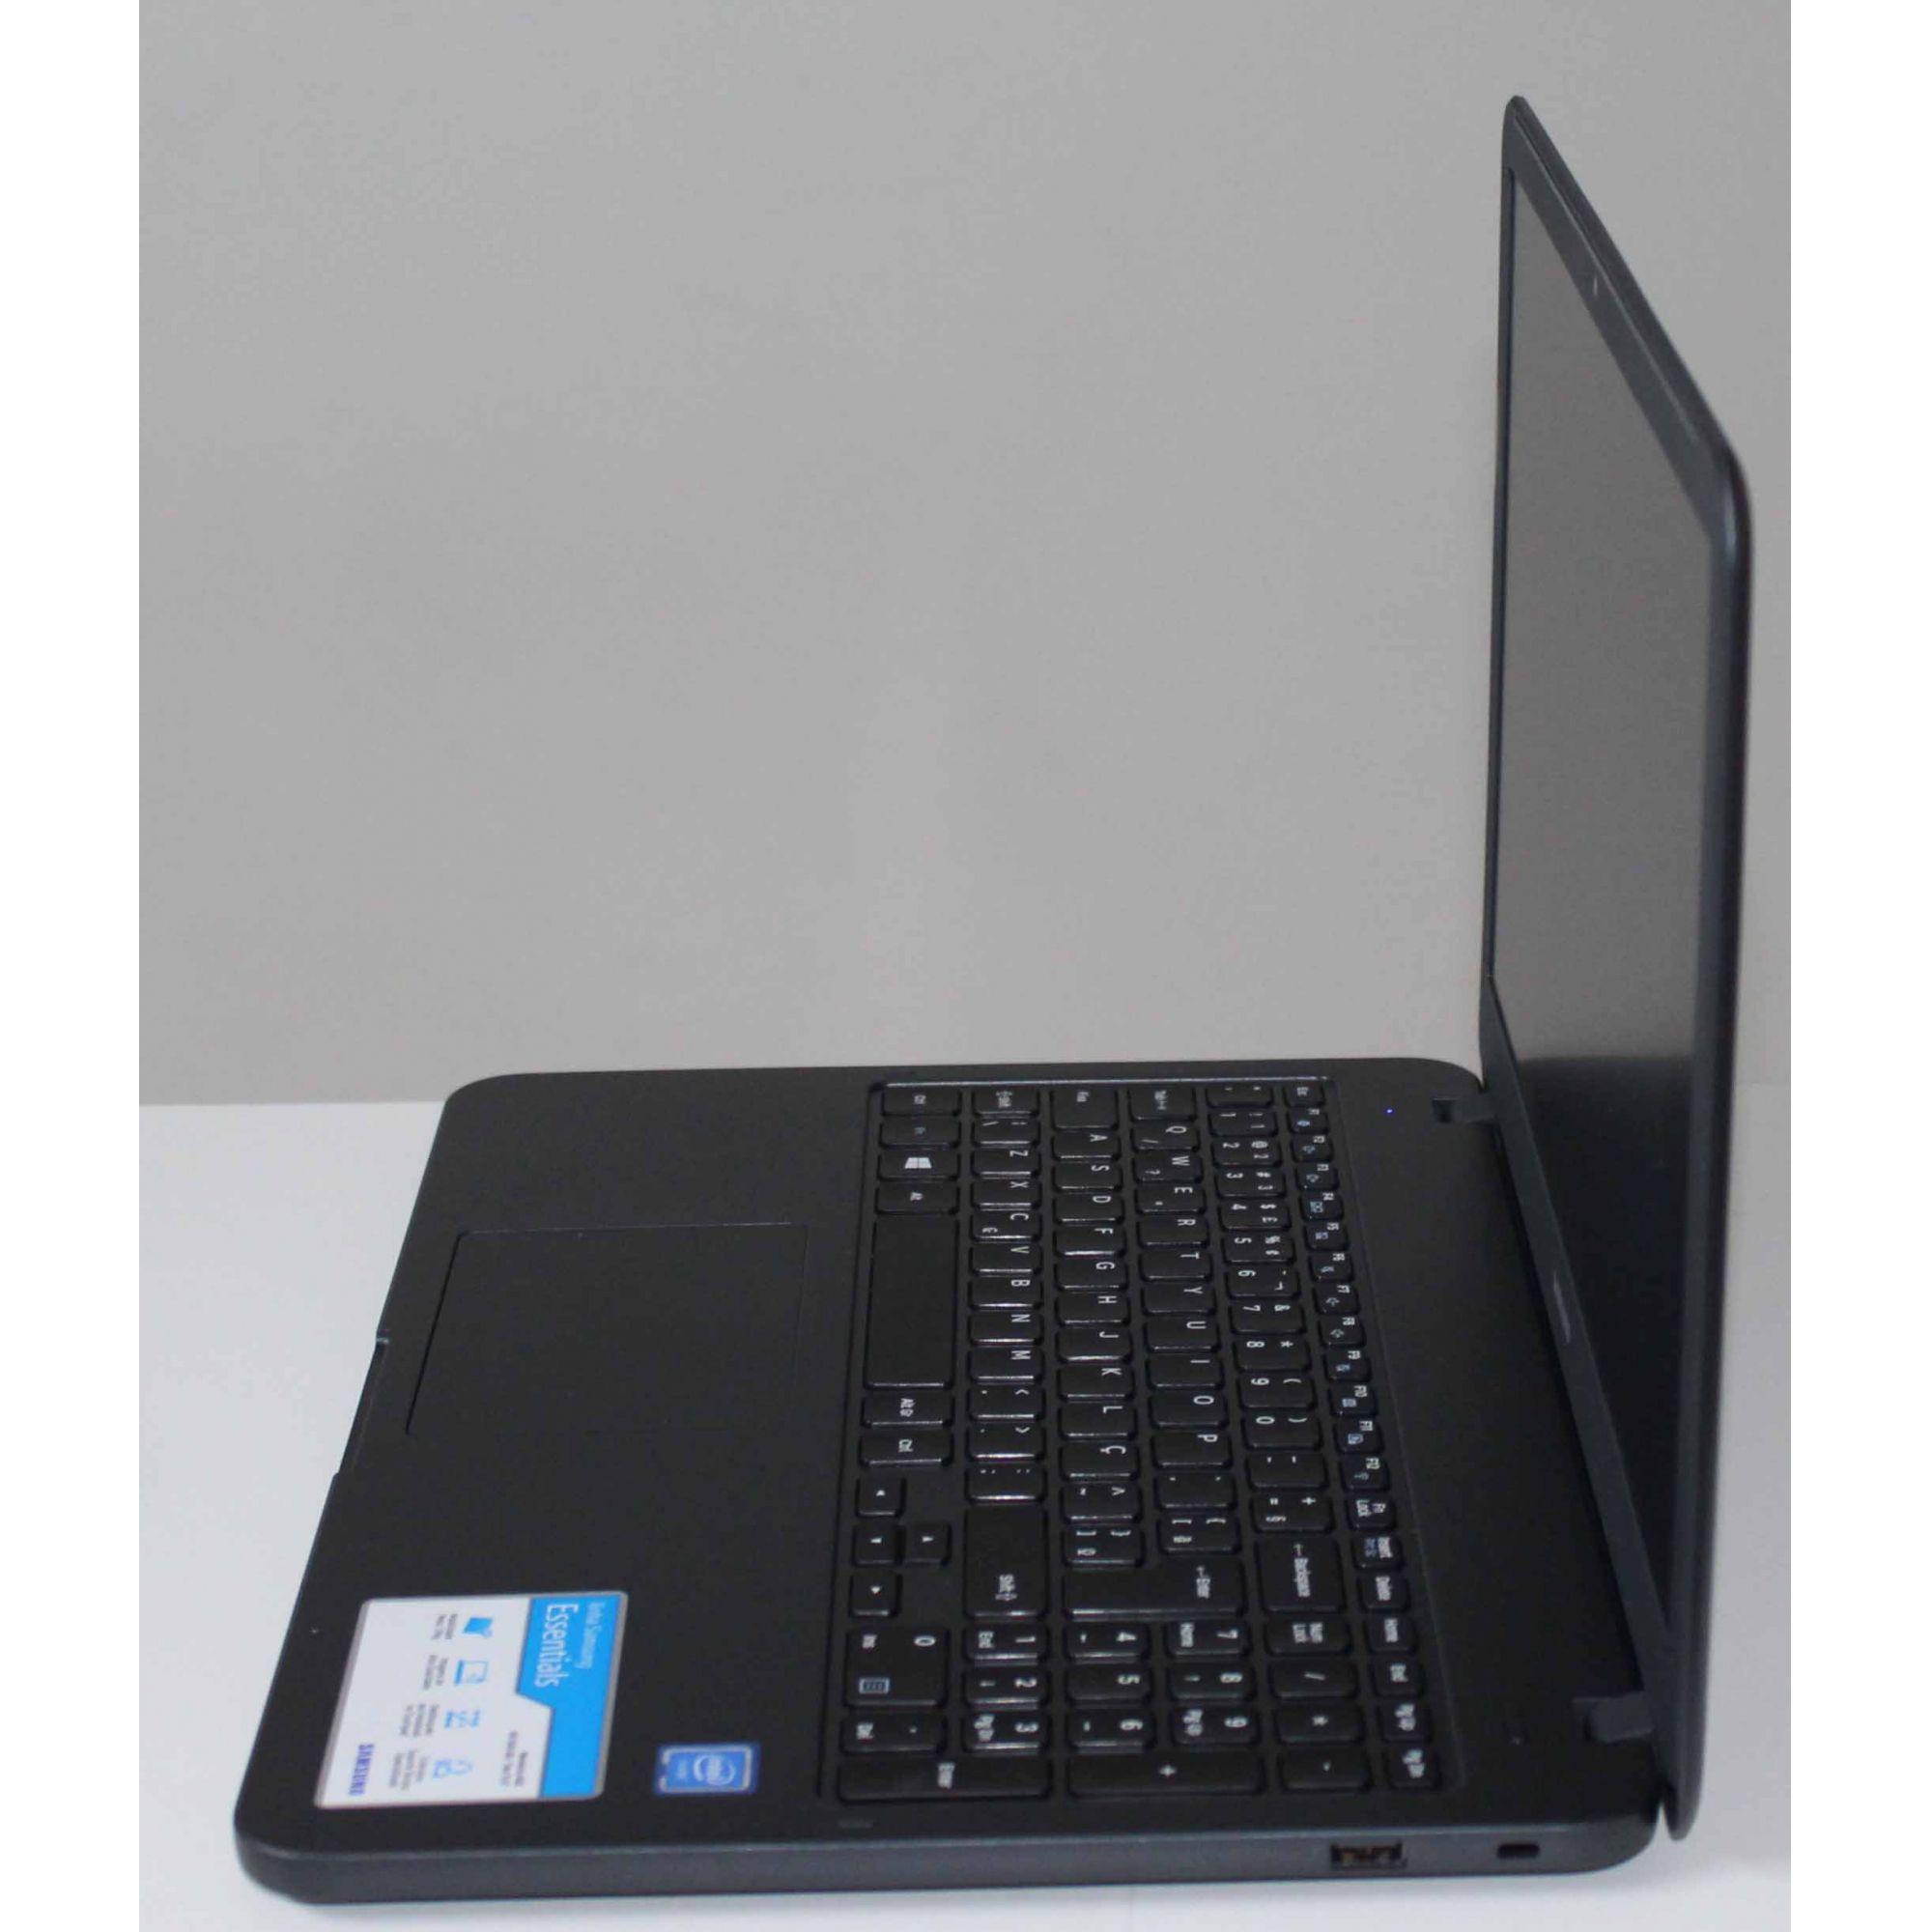 Notebook Samsung NP350XBE 15.6'' Intel Celeron 1.8GHz 4GB HD-500GB + Alphanumérico